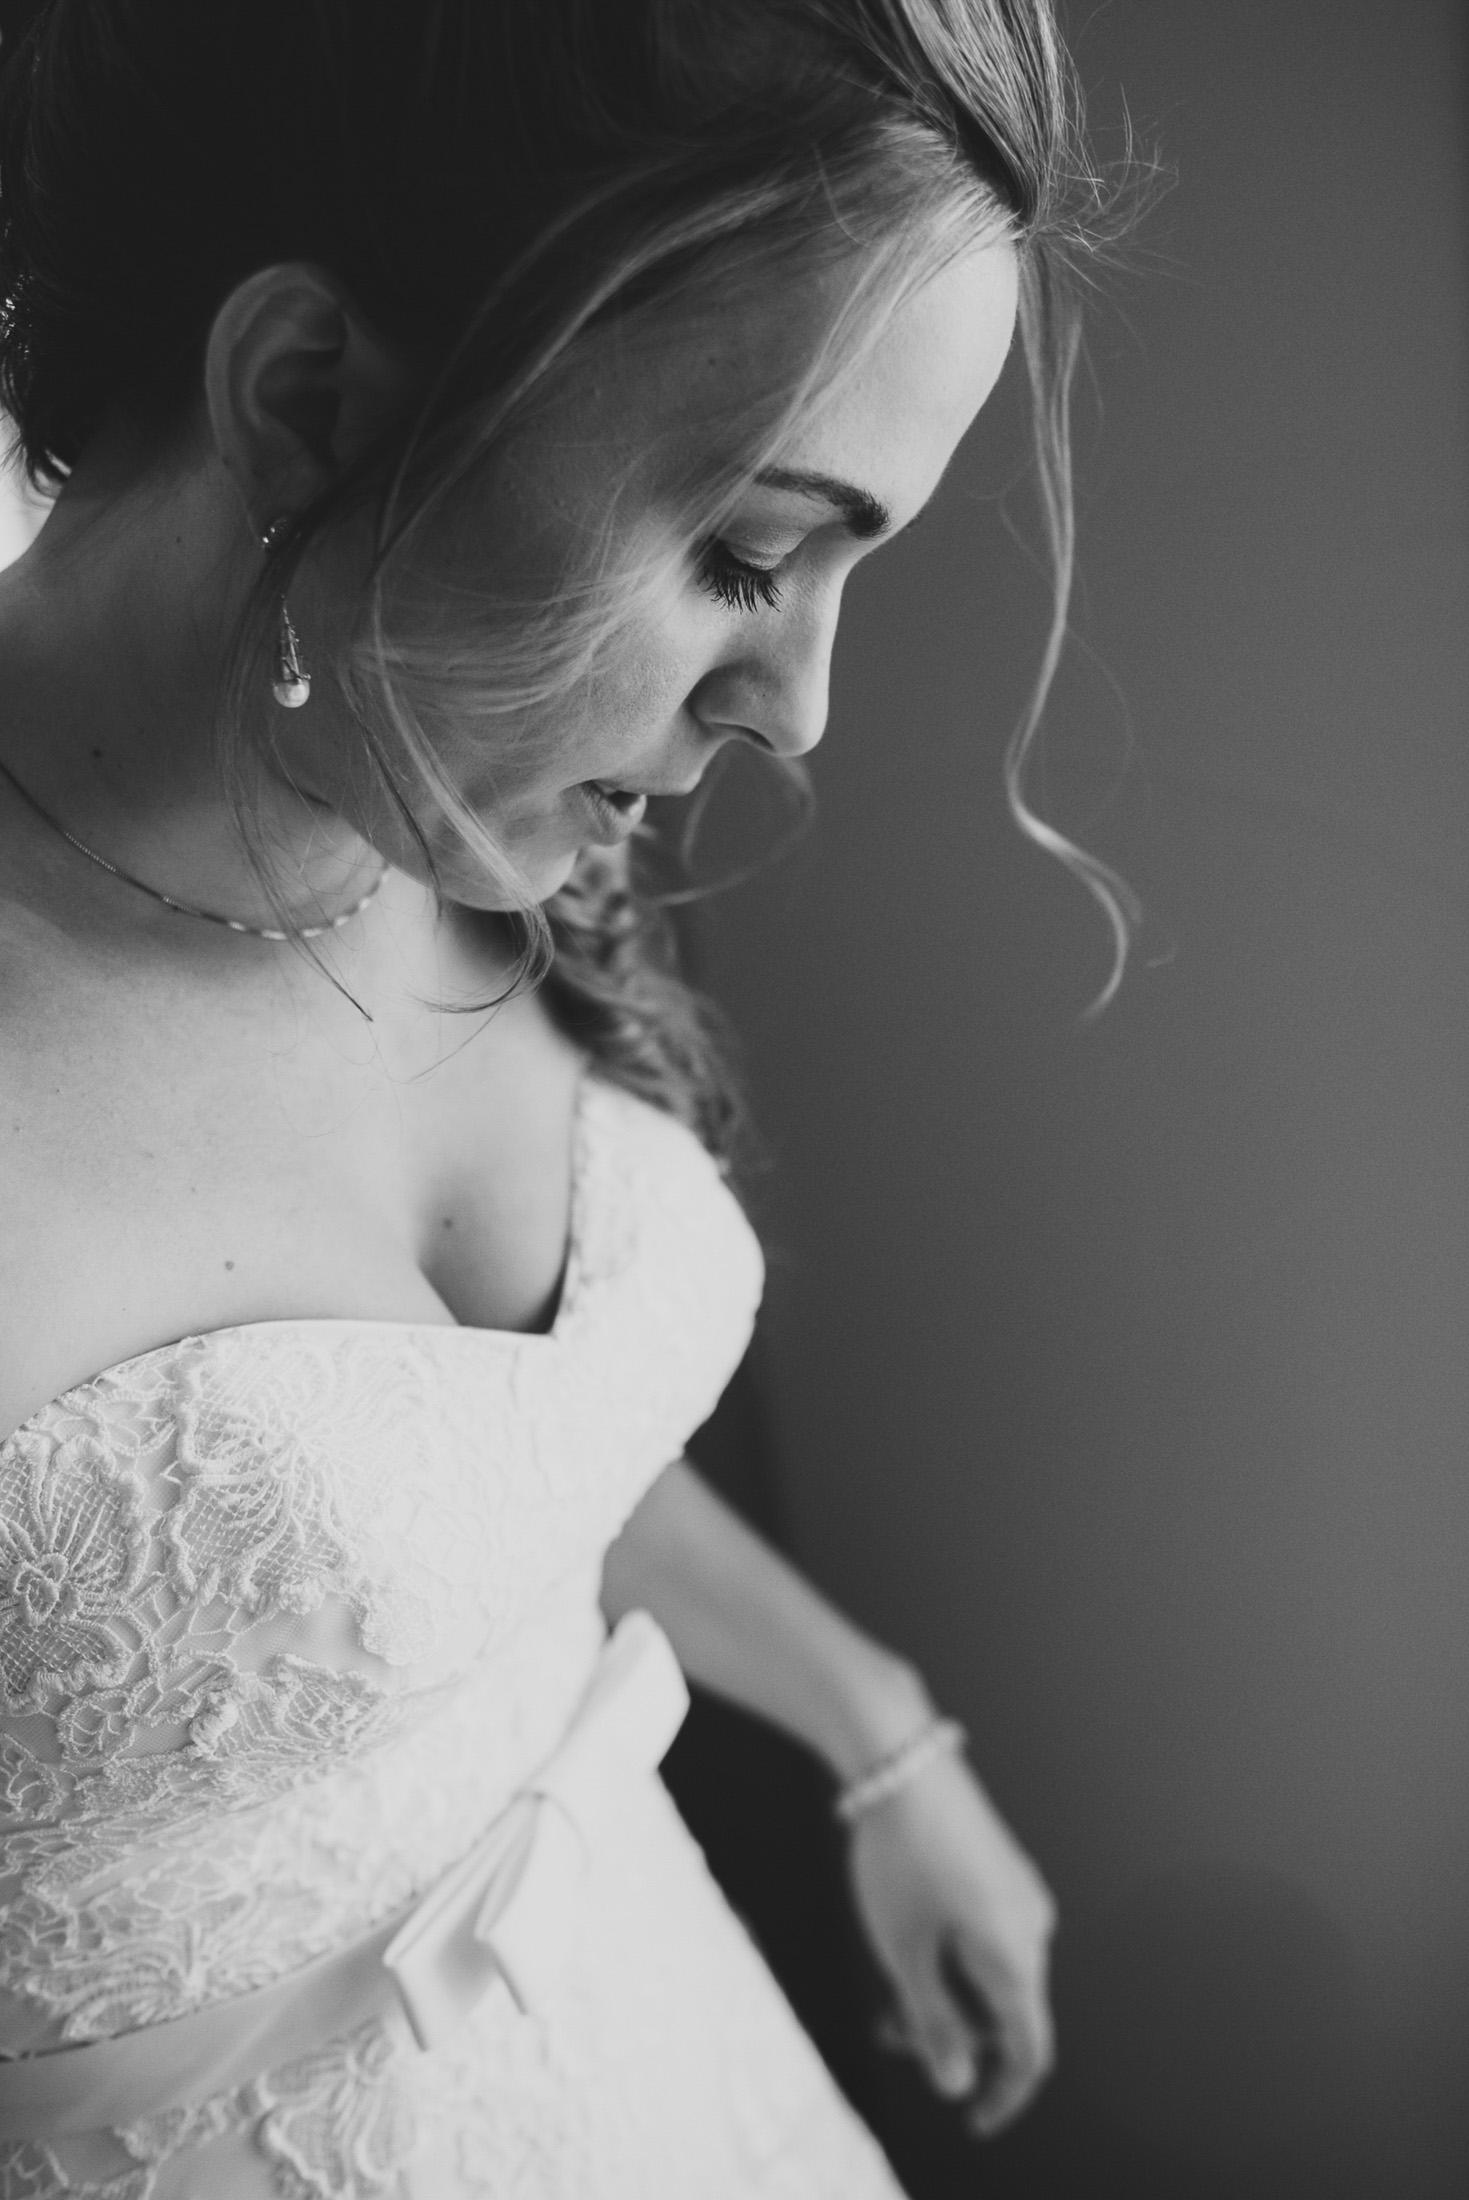 98elopement-photographer-colorado-telluride_wedding_photographer_colorado_mountain_wedding_photographer_brie&tyler_0563_vintage_black_and_white_film.jpg